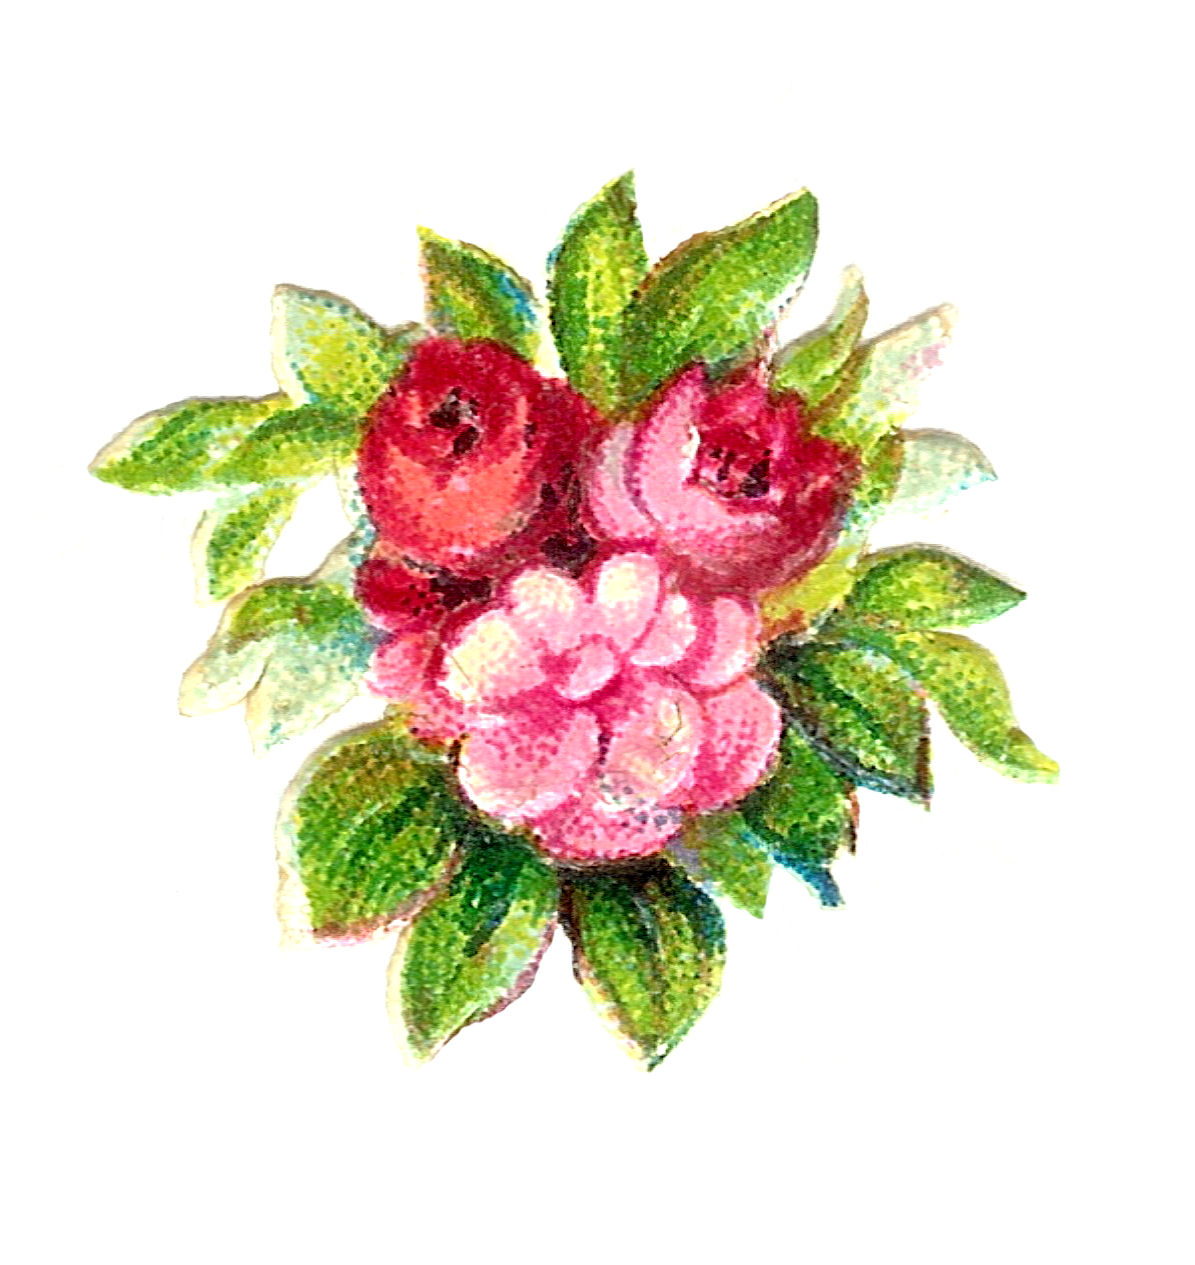 Antique Images Digital Vintage 3 Pink Rose Botanical Scrapbooking Bouquet Clip Art